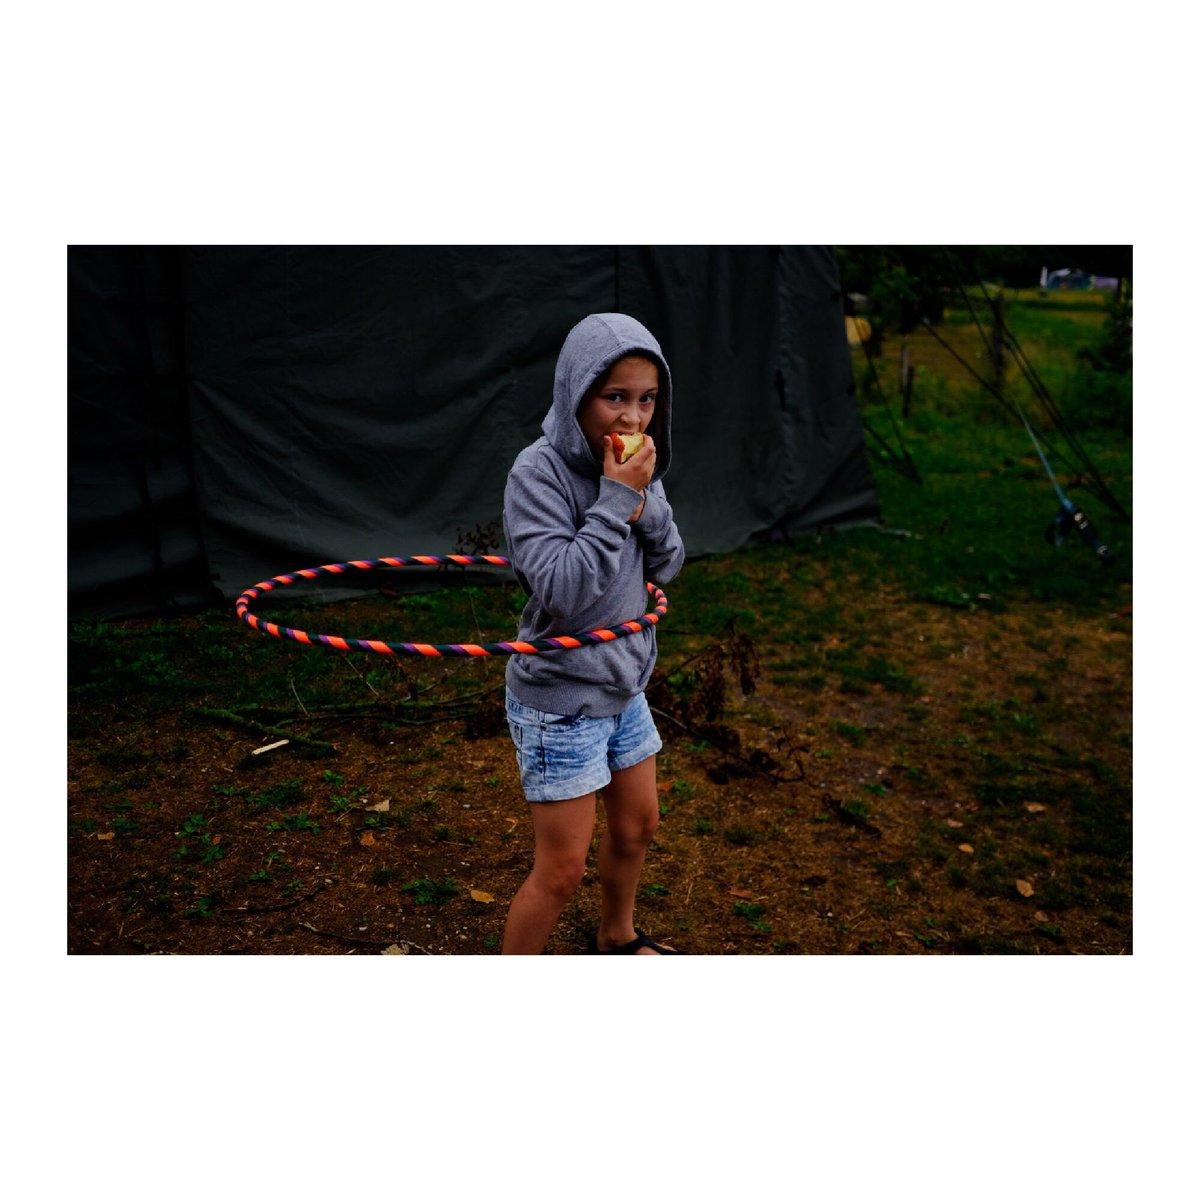 🍎  #hula #hooping #girl #yungharek #camping #outdoors #lensculture#portraitmood #portraiture #paperjournalmag#noicemag#nowness#streetphotography #streetphotographers  #portraitmood